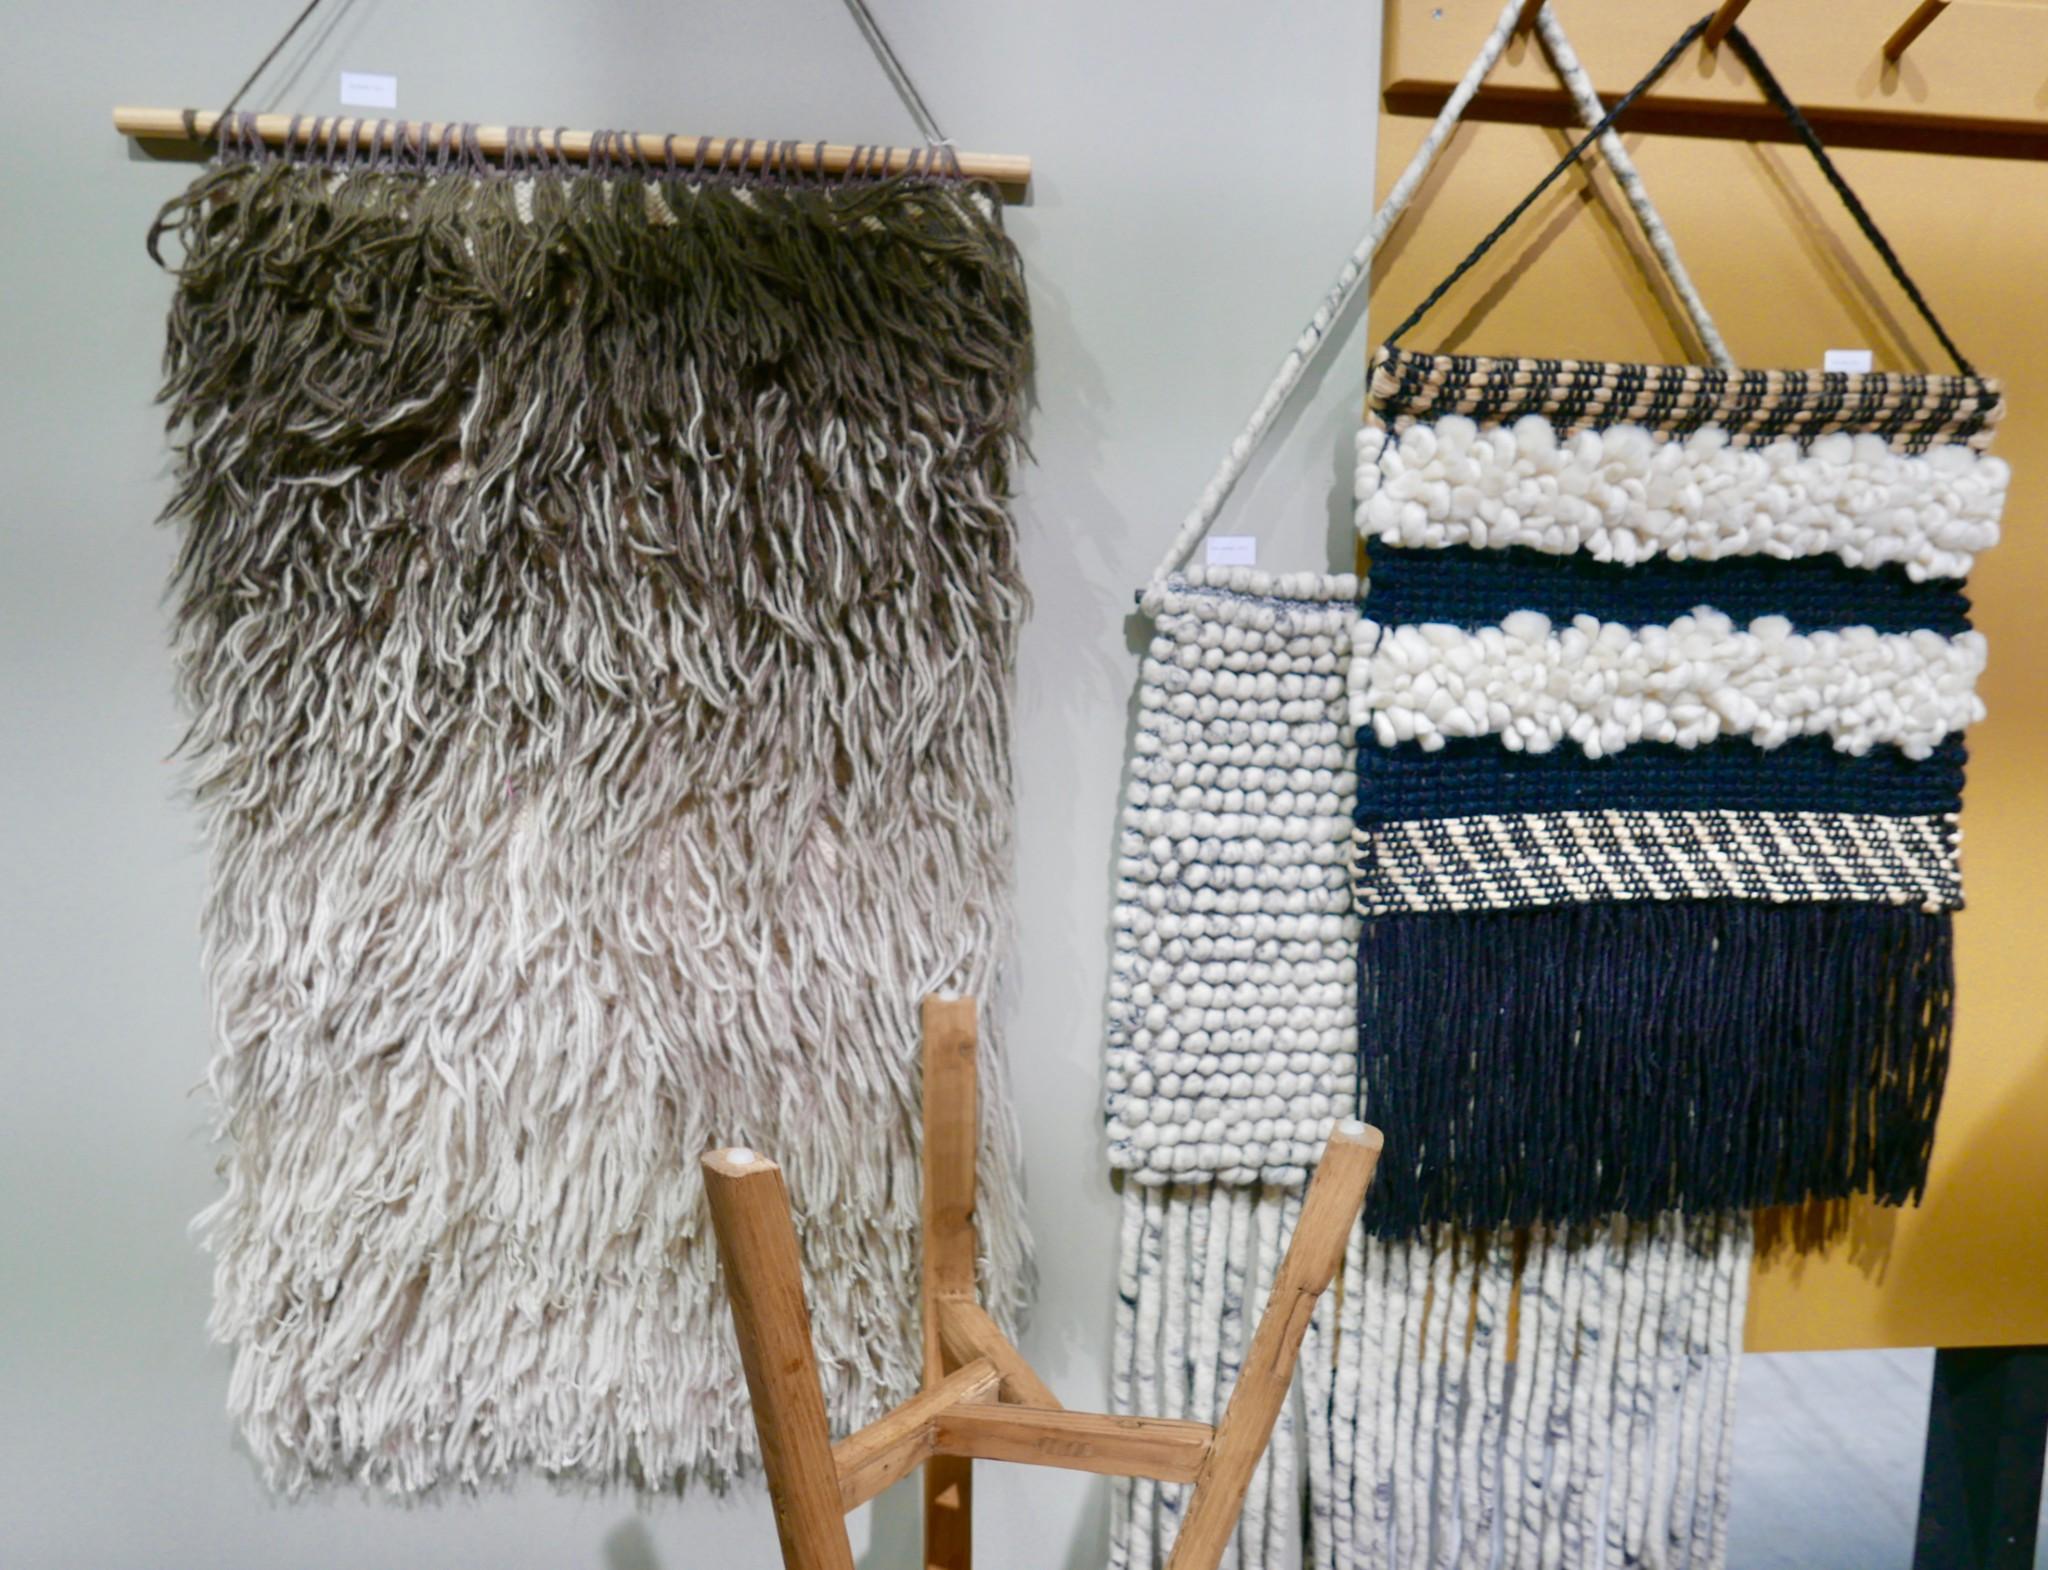 wall-hangings-oslo-design-fair-tendenser